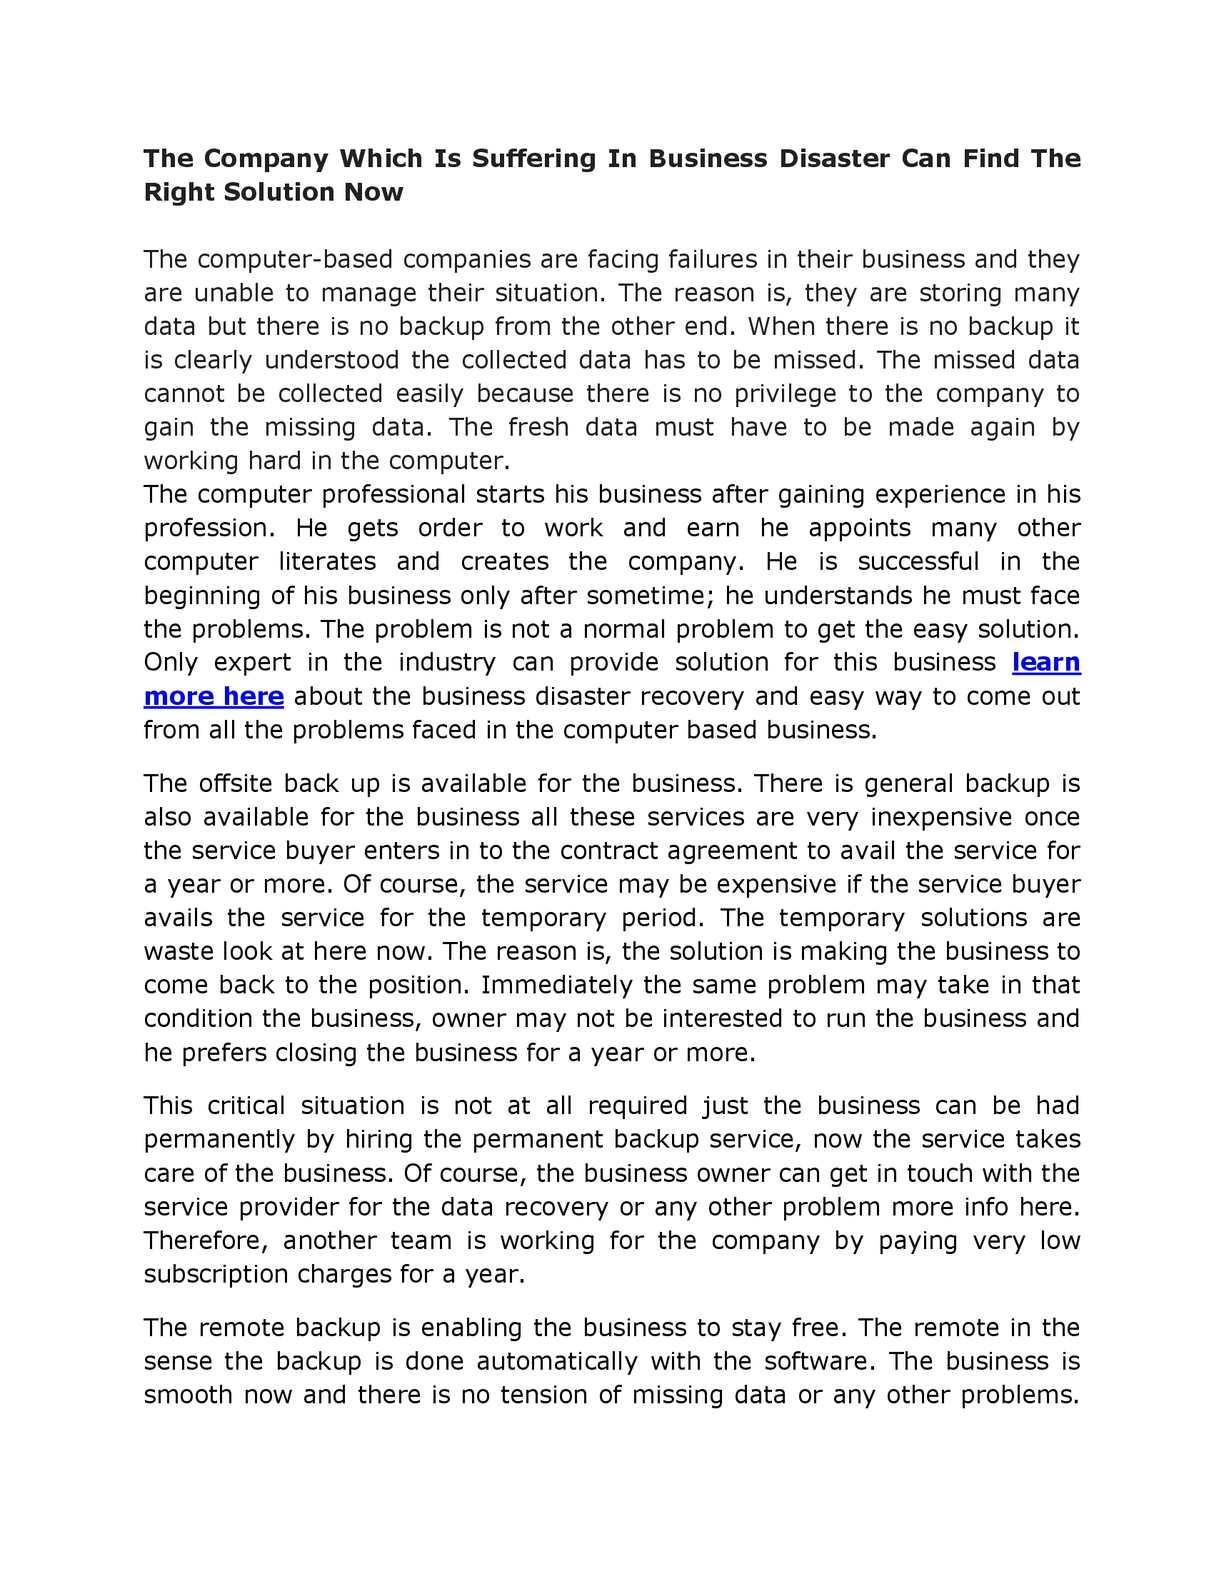 Calaméo - 129 Critical Data Backup Solutions